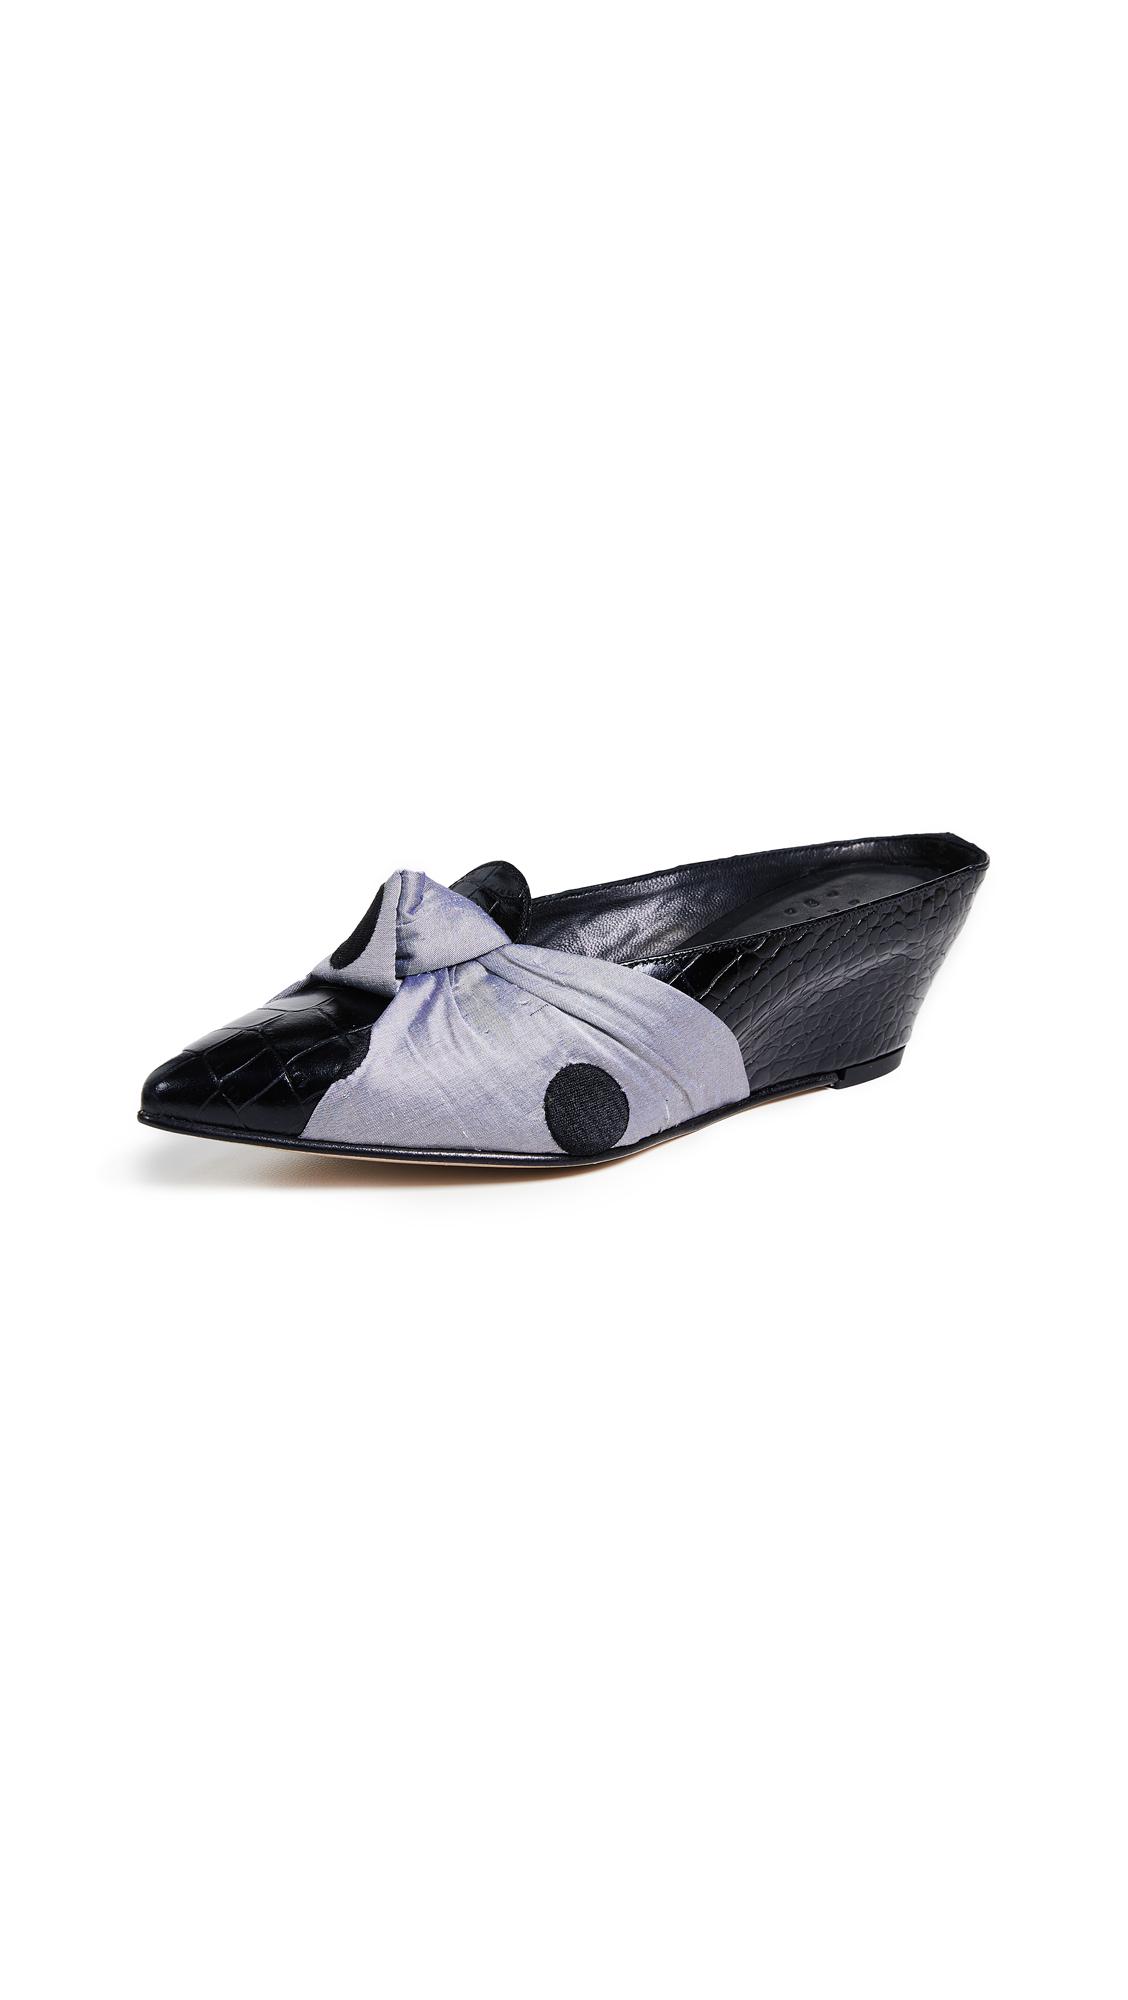 Trademark Adrien Tie Mules - Black Croc